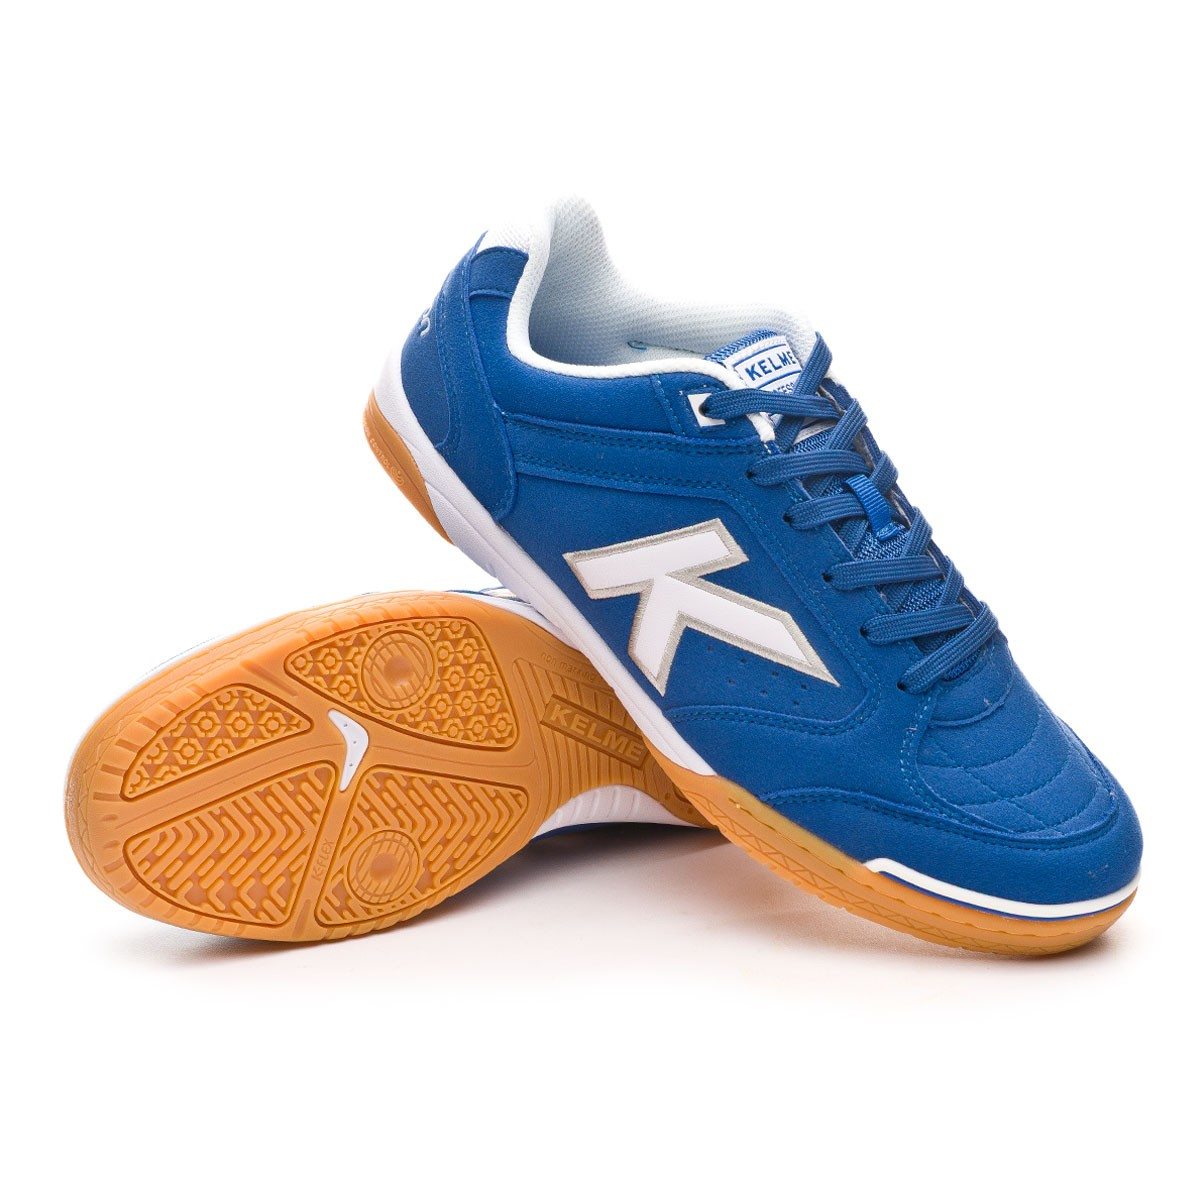 7d9367f8099 Futsal Boot Kelme Precision Royal - Football store Fútbol Emotion